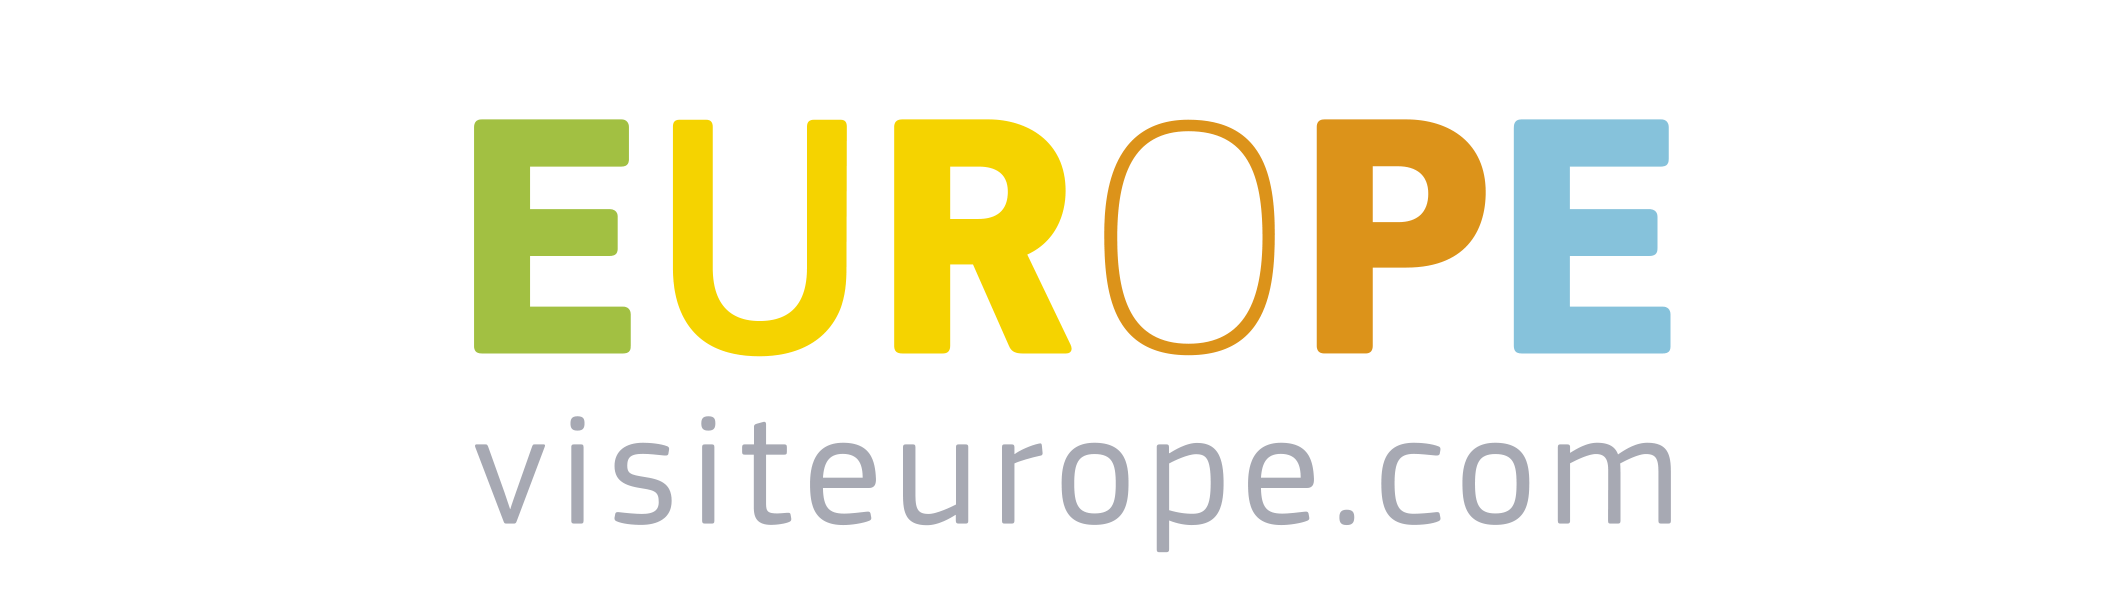 EUROPE-Logo-URL-EN1.png